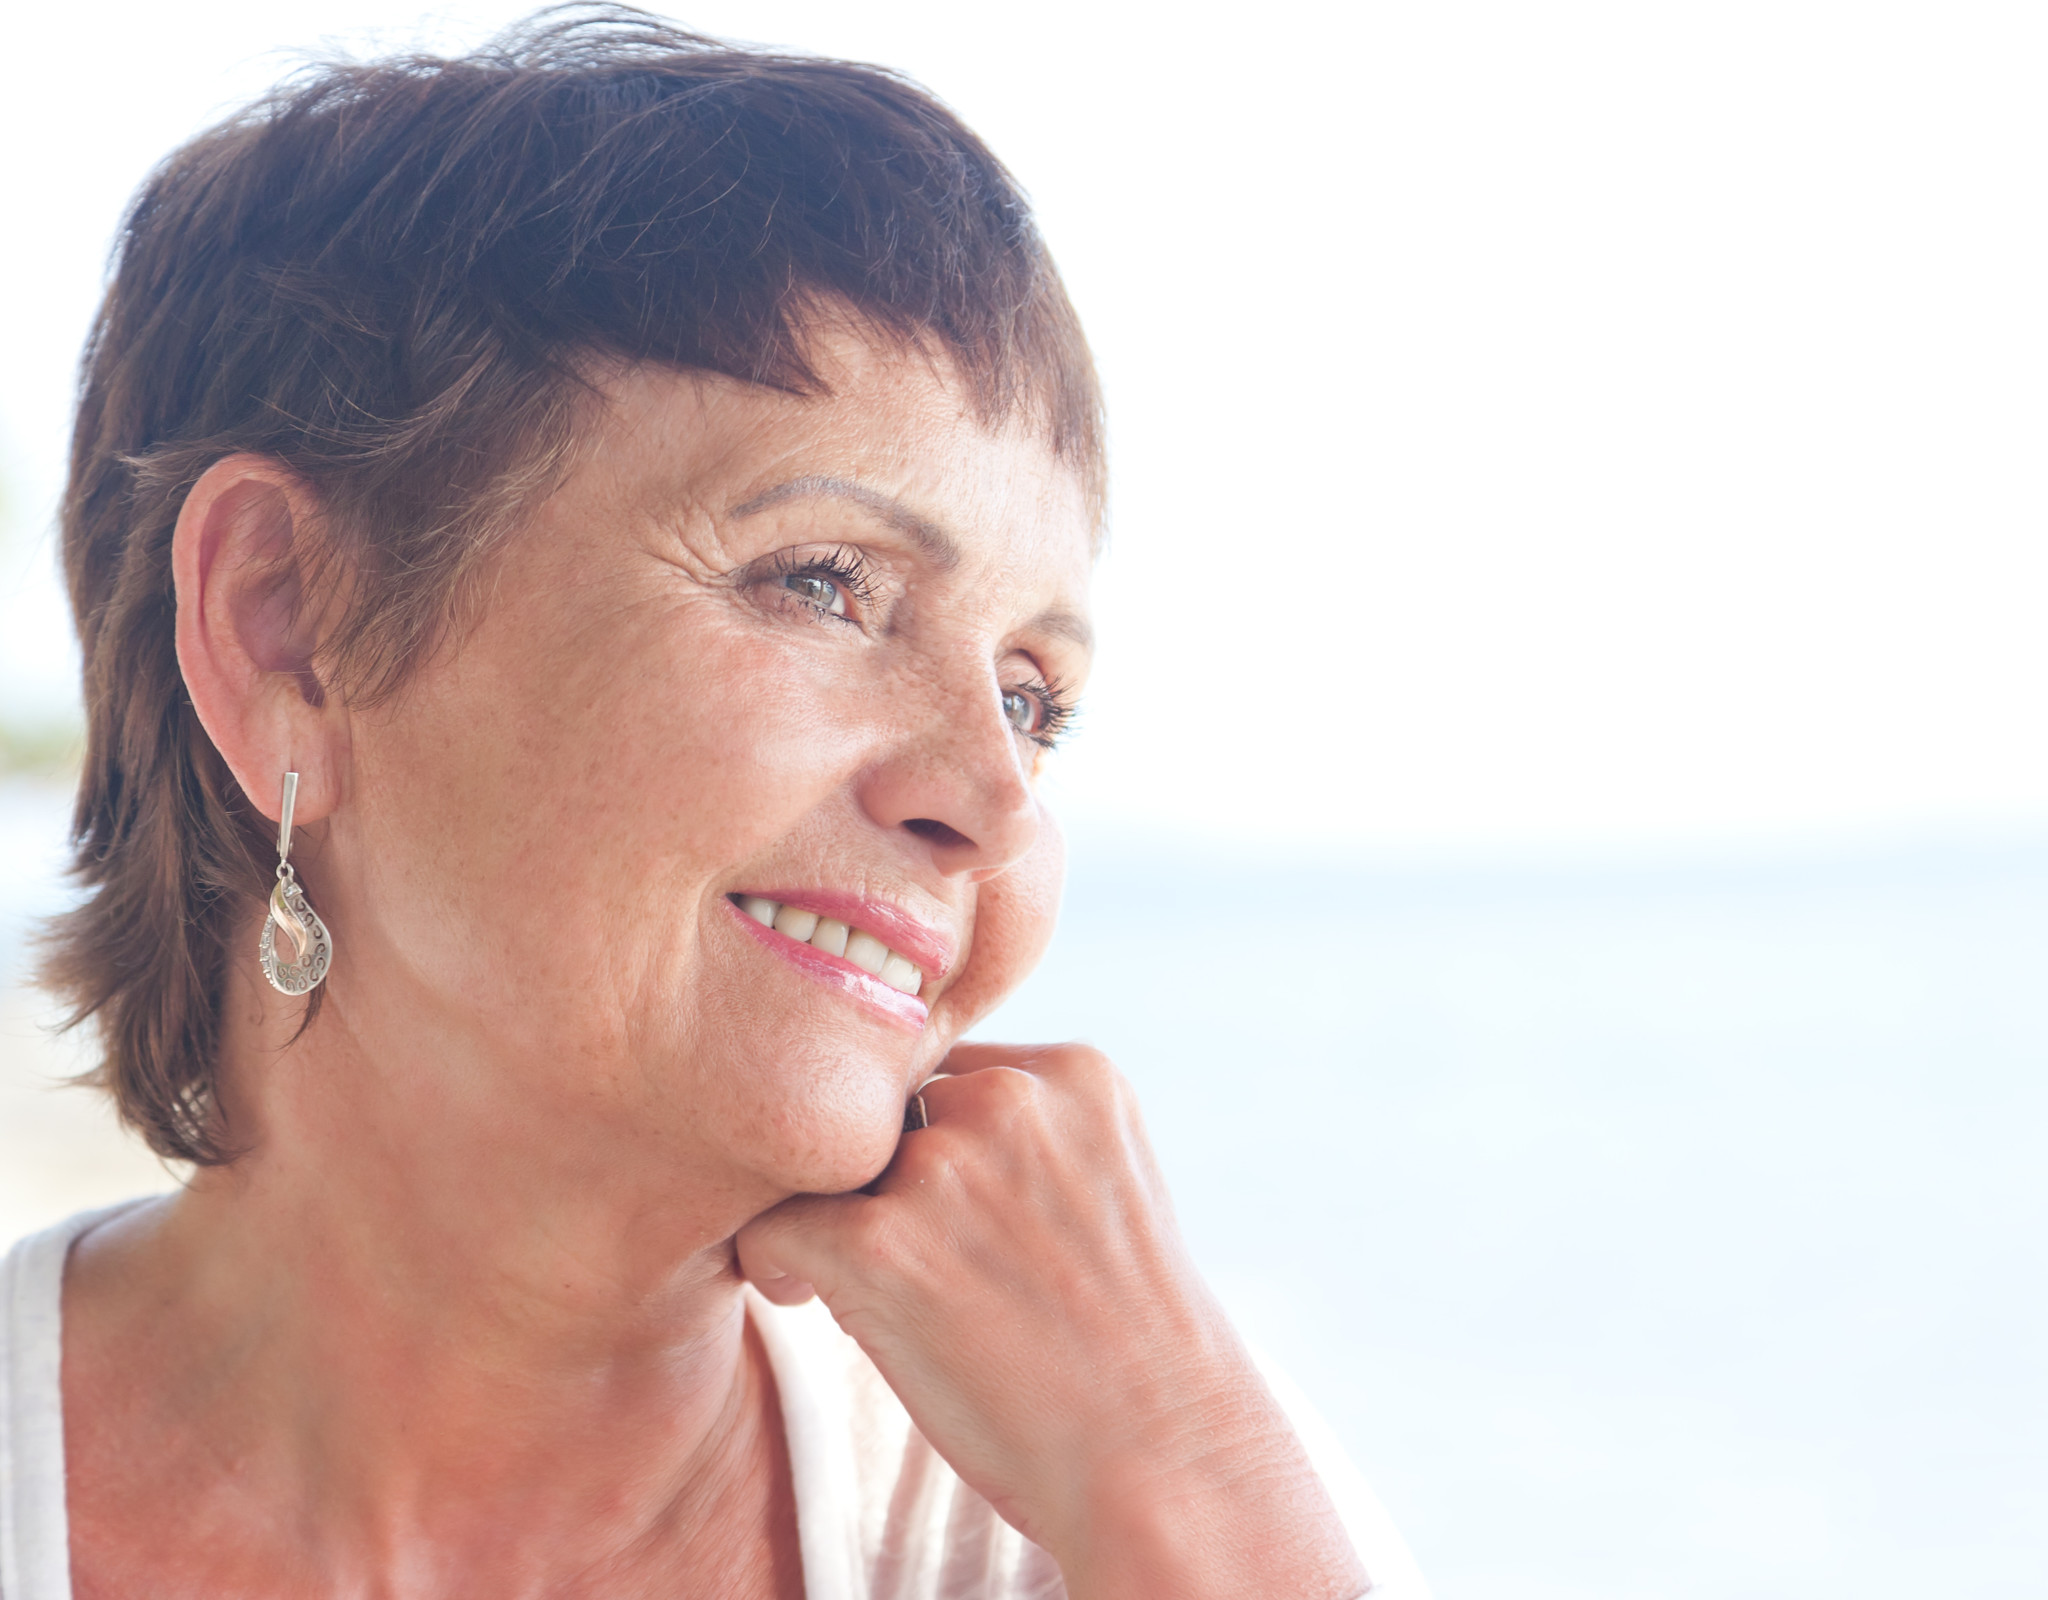 Uterine Fibroids Conditions & Treatment